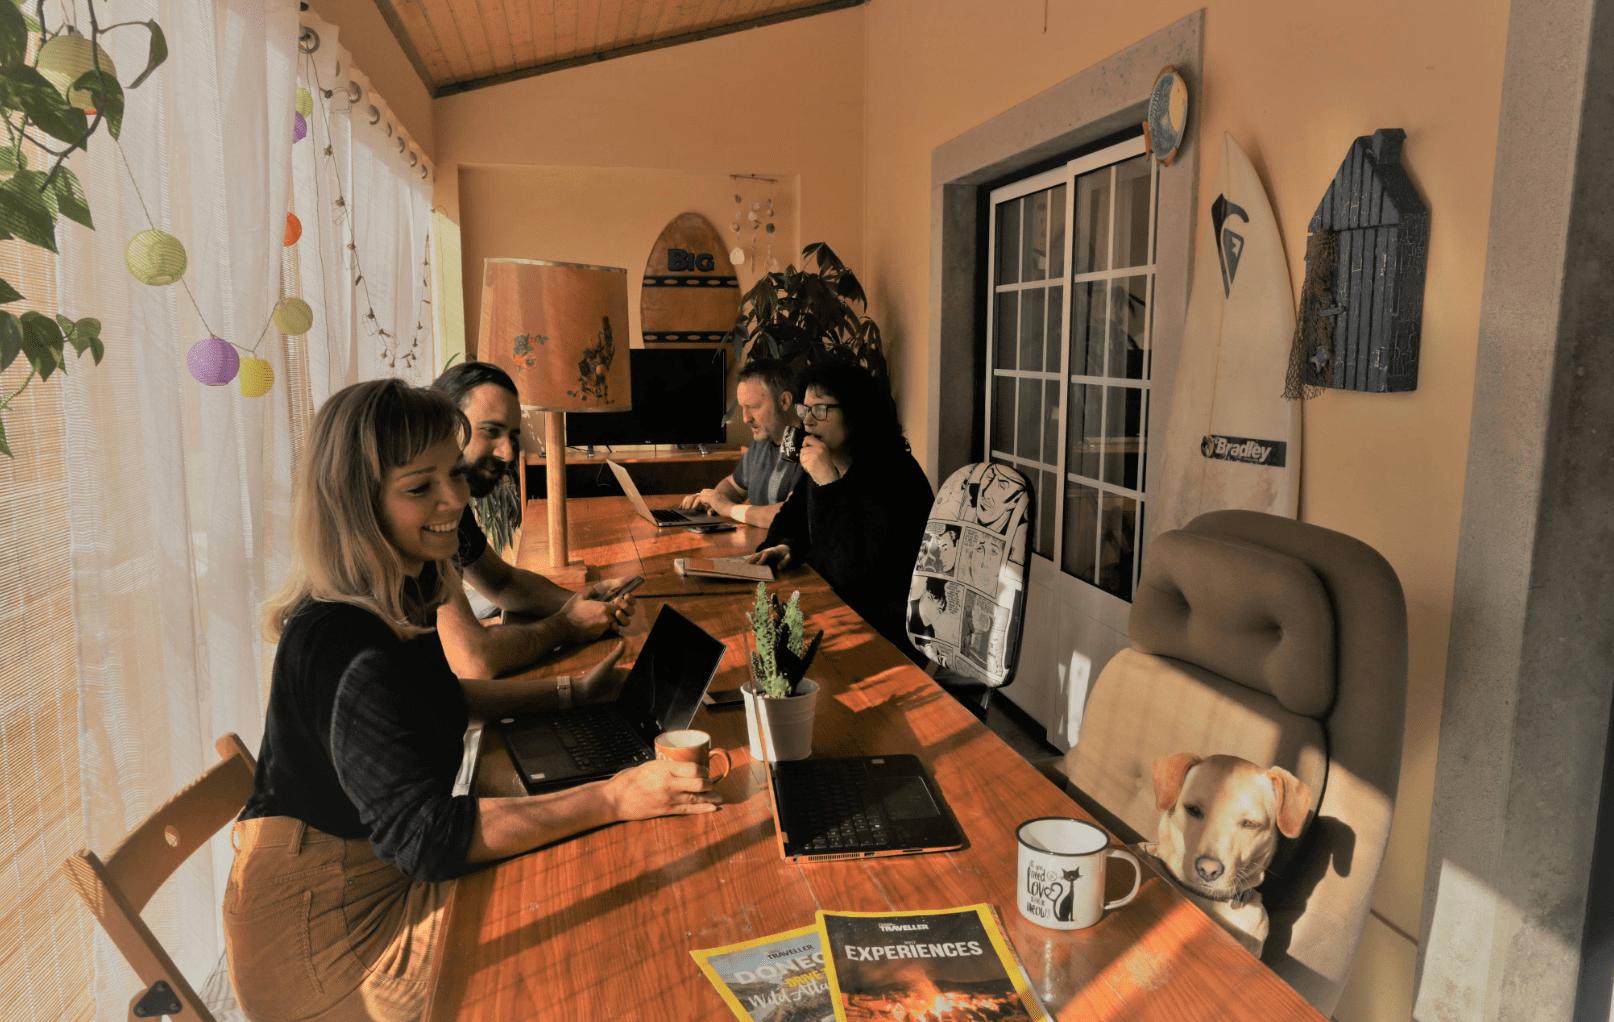 PipeDream-Coworking-Coliving-cowork-peniche-leiria-til-magazine